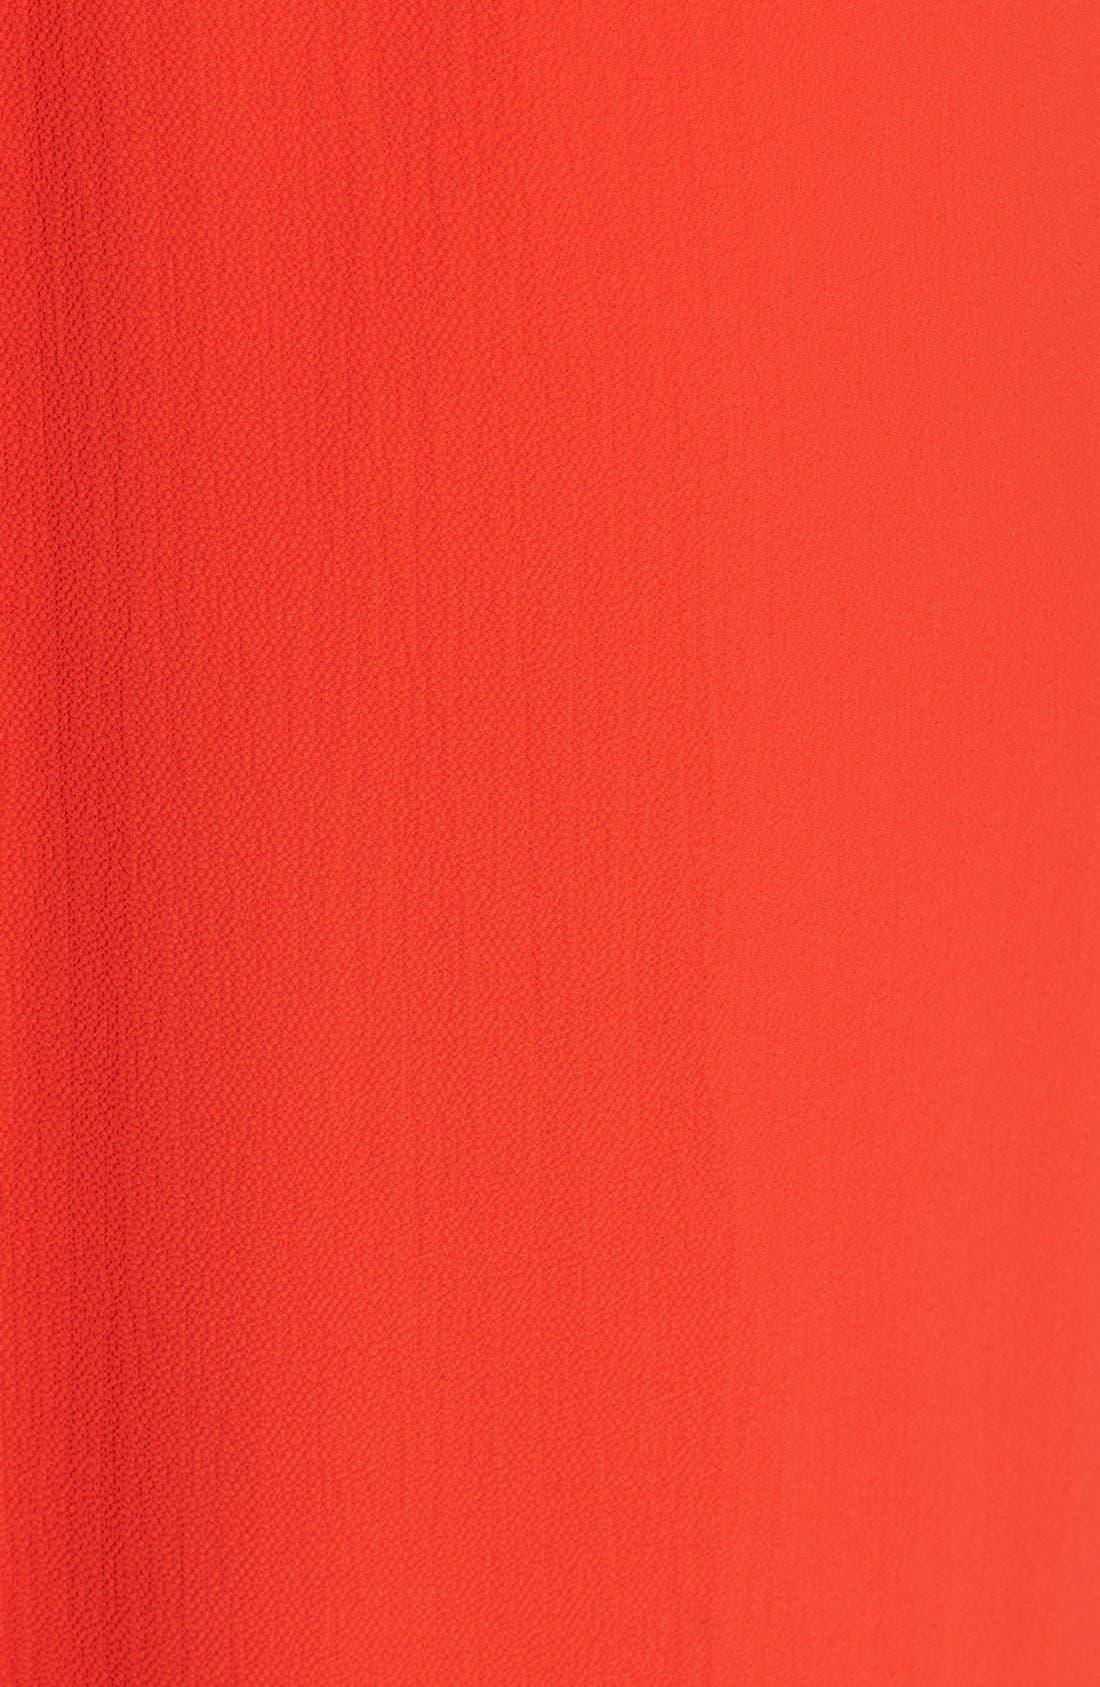 Alternate Image 3  - Tildon Strap Detail Maxi Dress